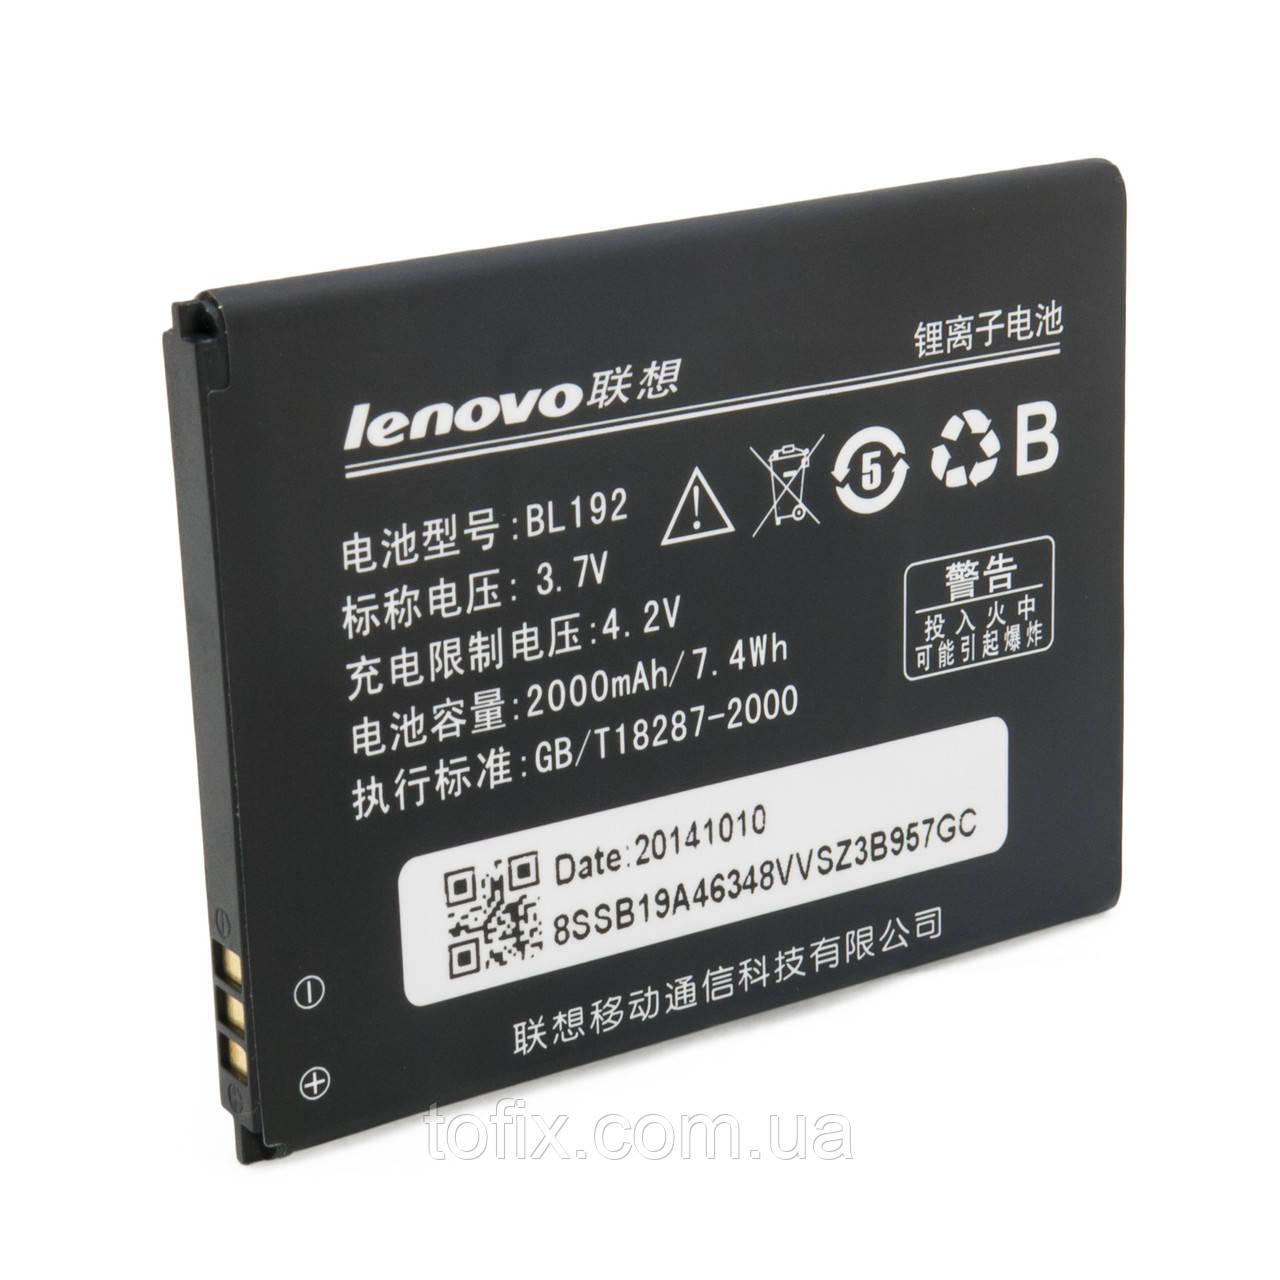 Батарея (акб, акумулятор) BL192 для Lenovo A590 IdeaPhone, 2000 mAh, оригінал